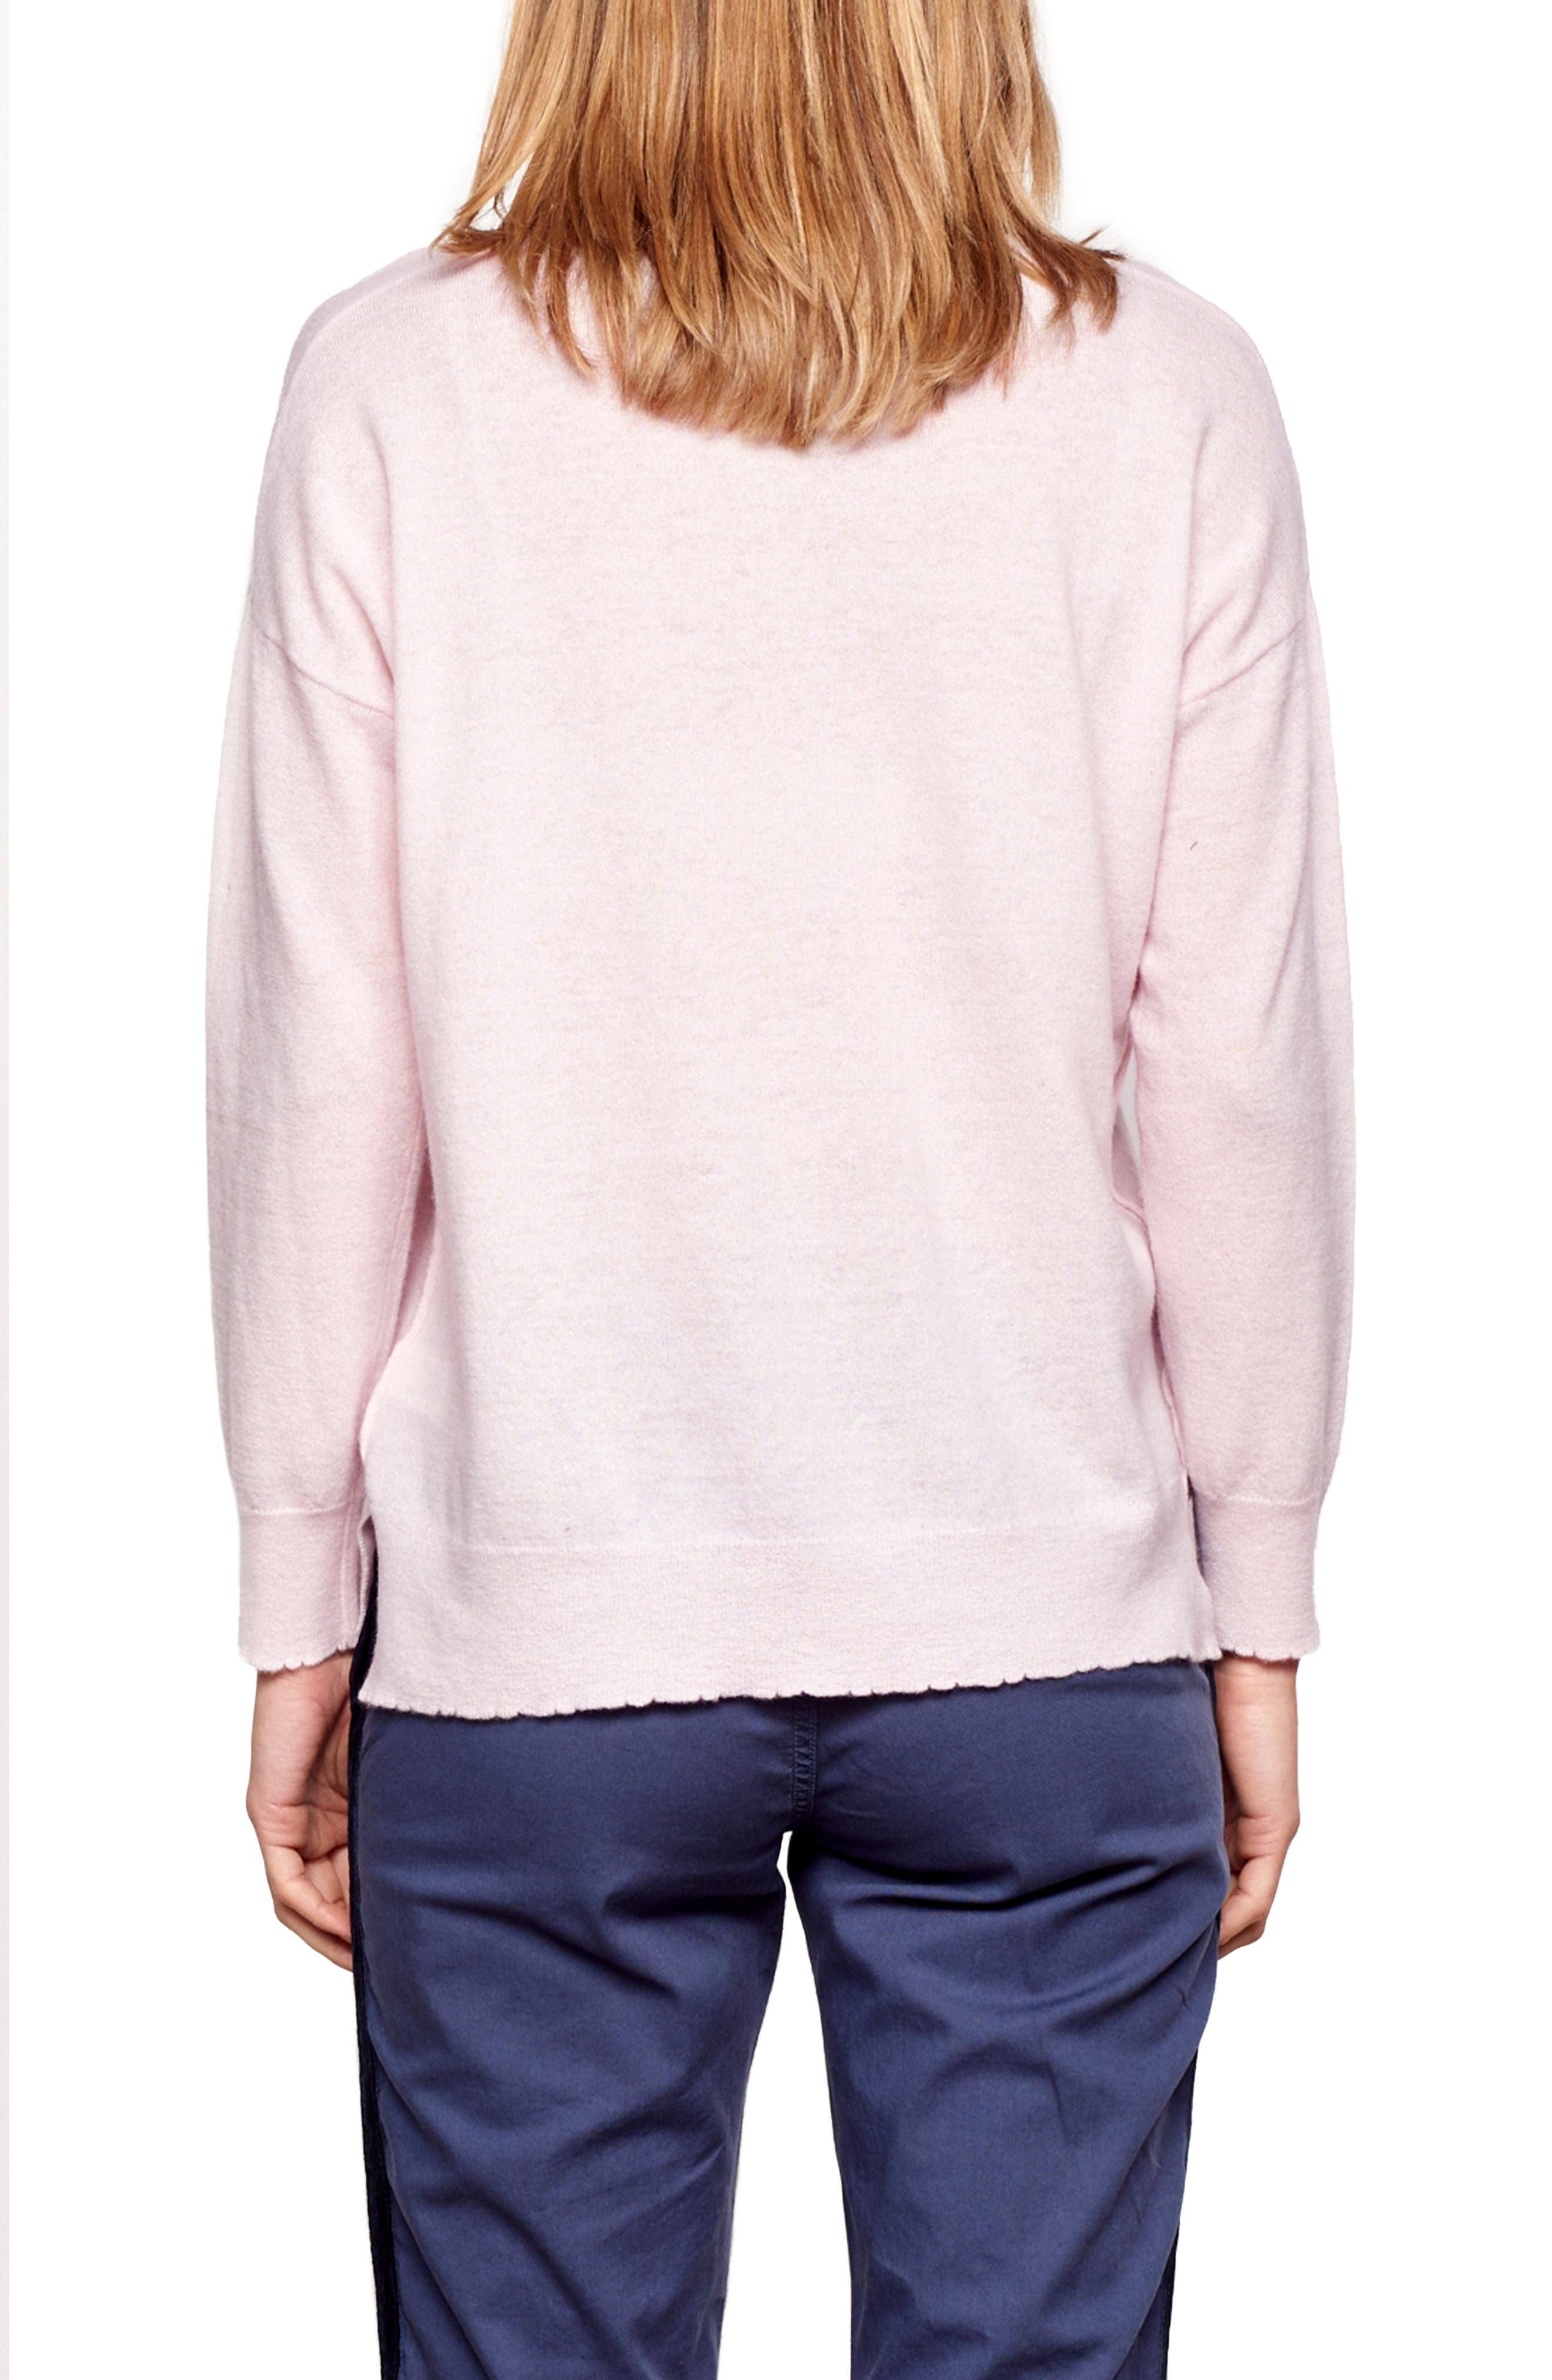 Crewneck Wool & Cashmere Sweater,                             Alternate thumbnail 2, color,                             PETAL